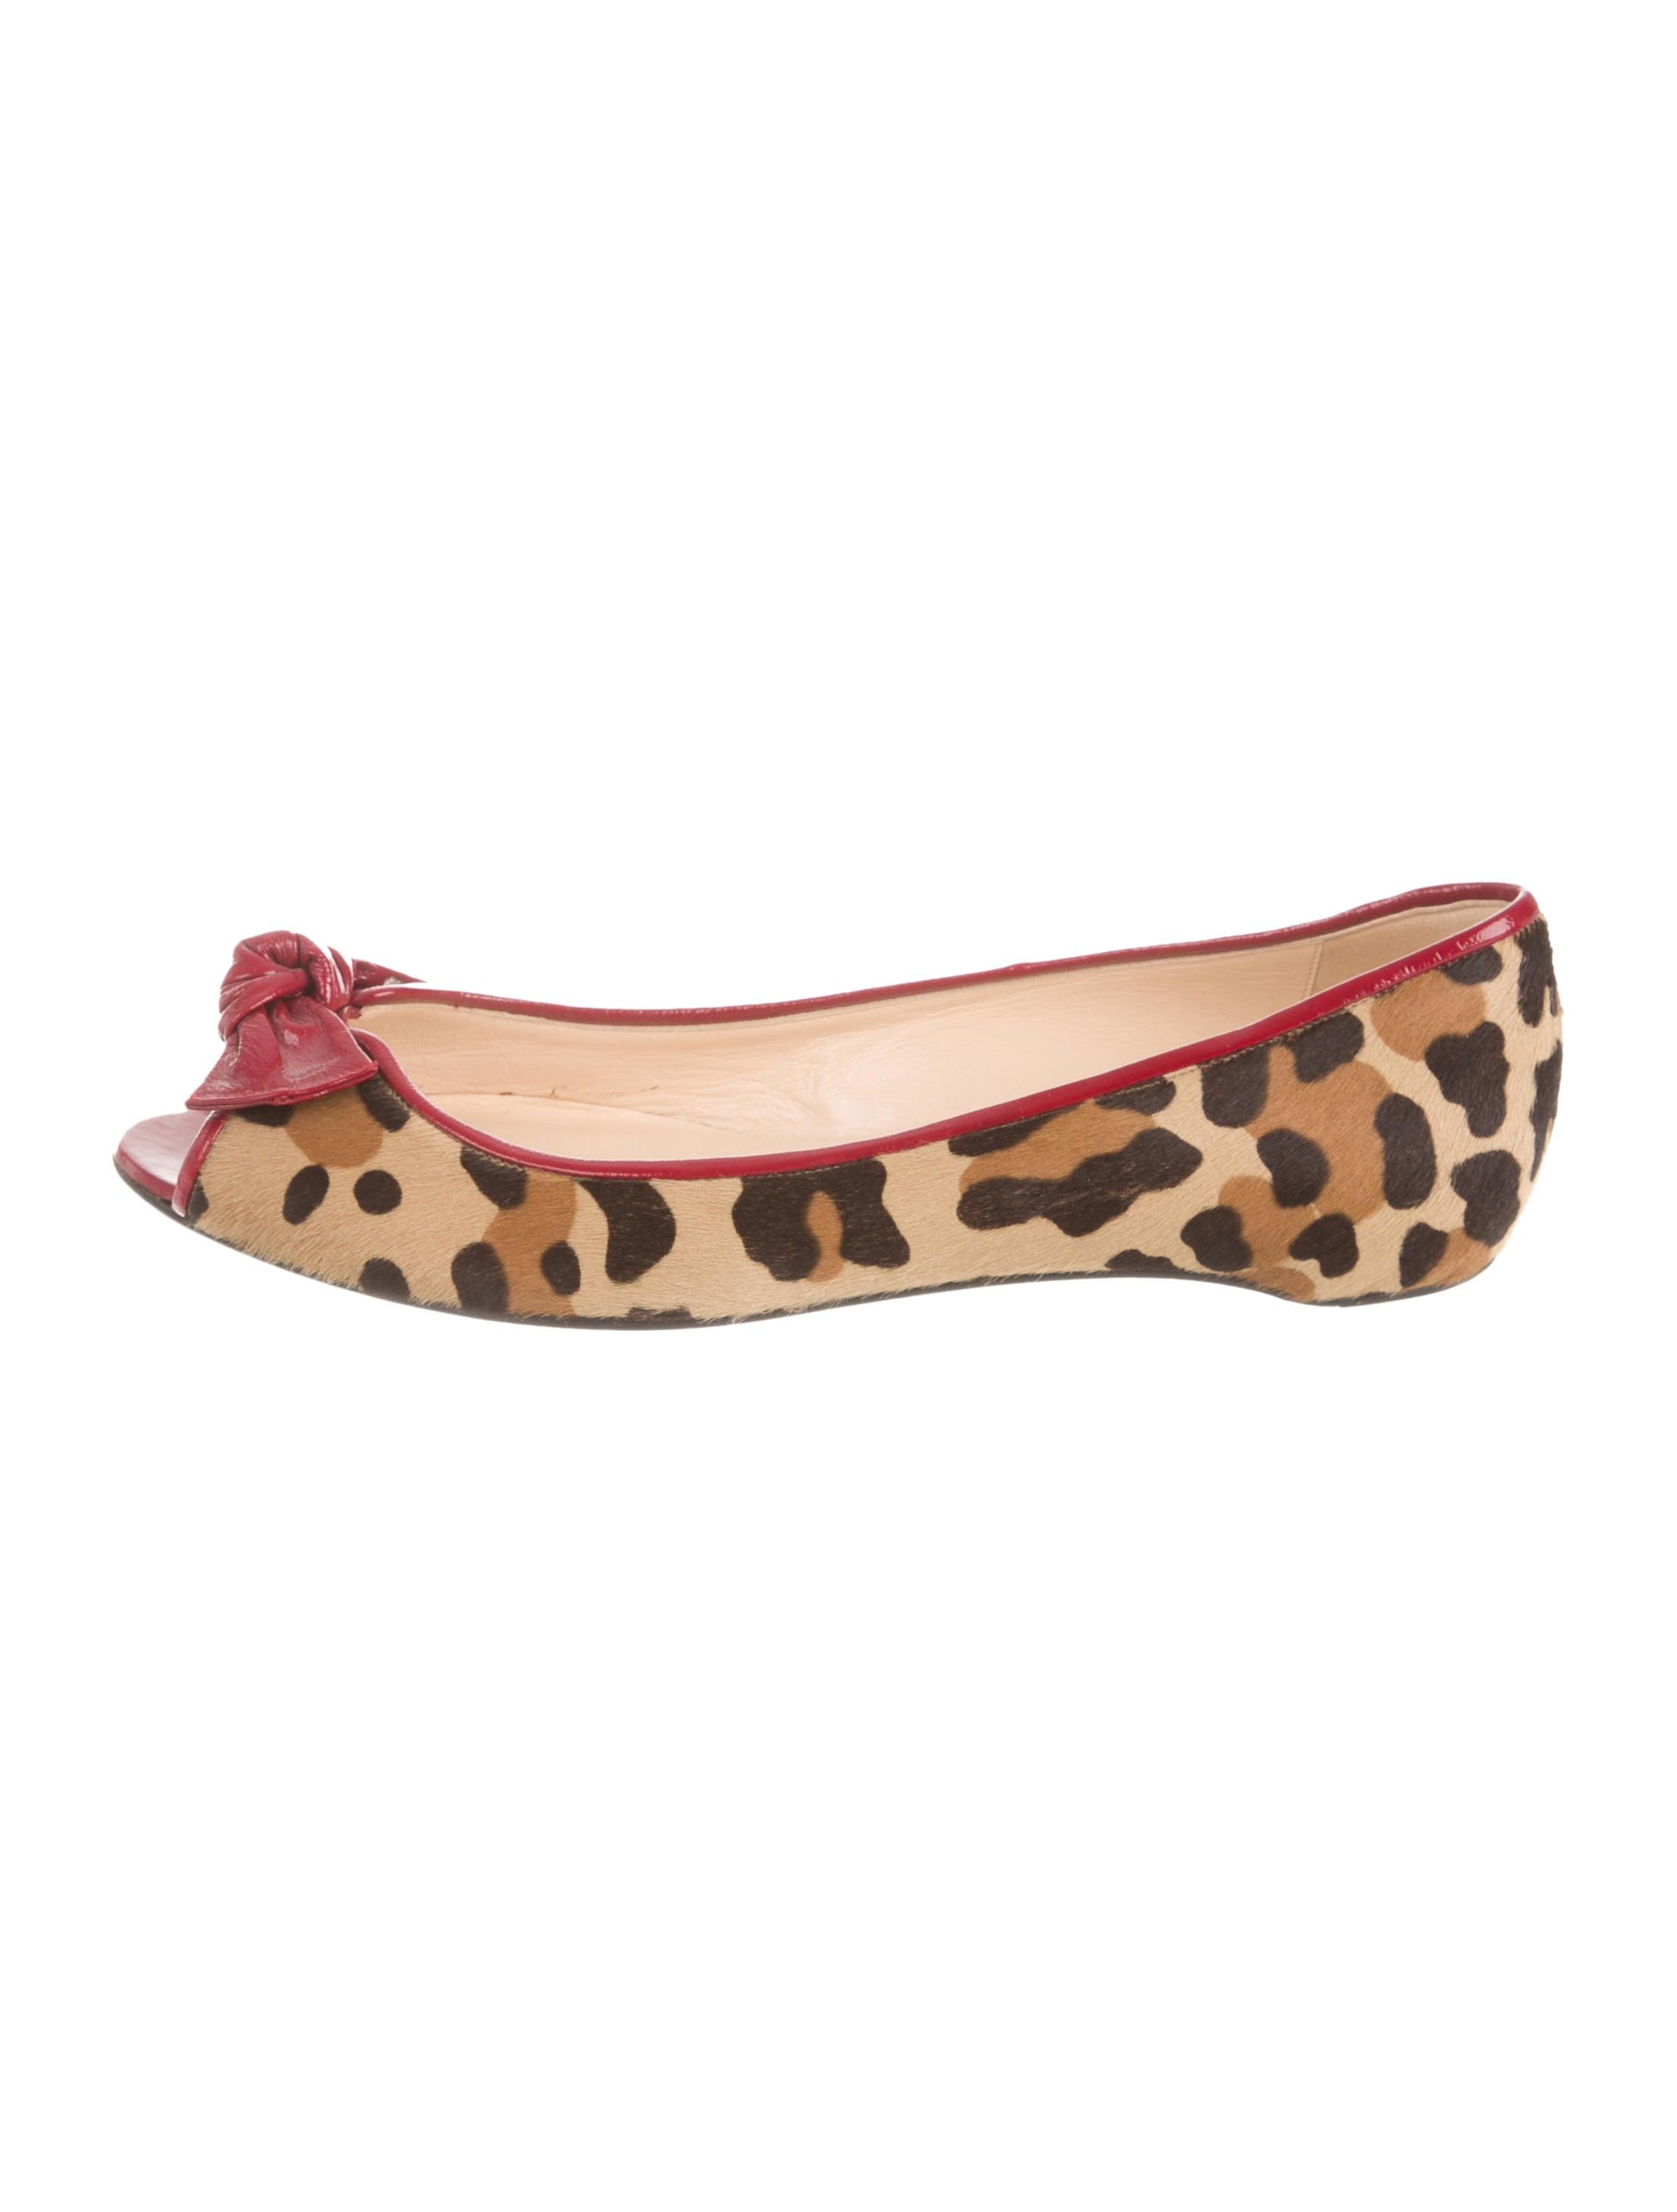 Christian Louboutin Ponyhair Peep-Toe Flats - Shoes - CHT42774 ...